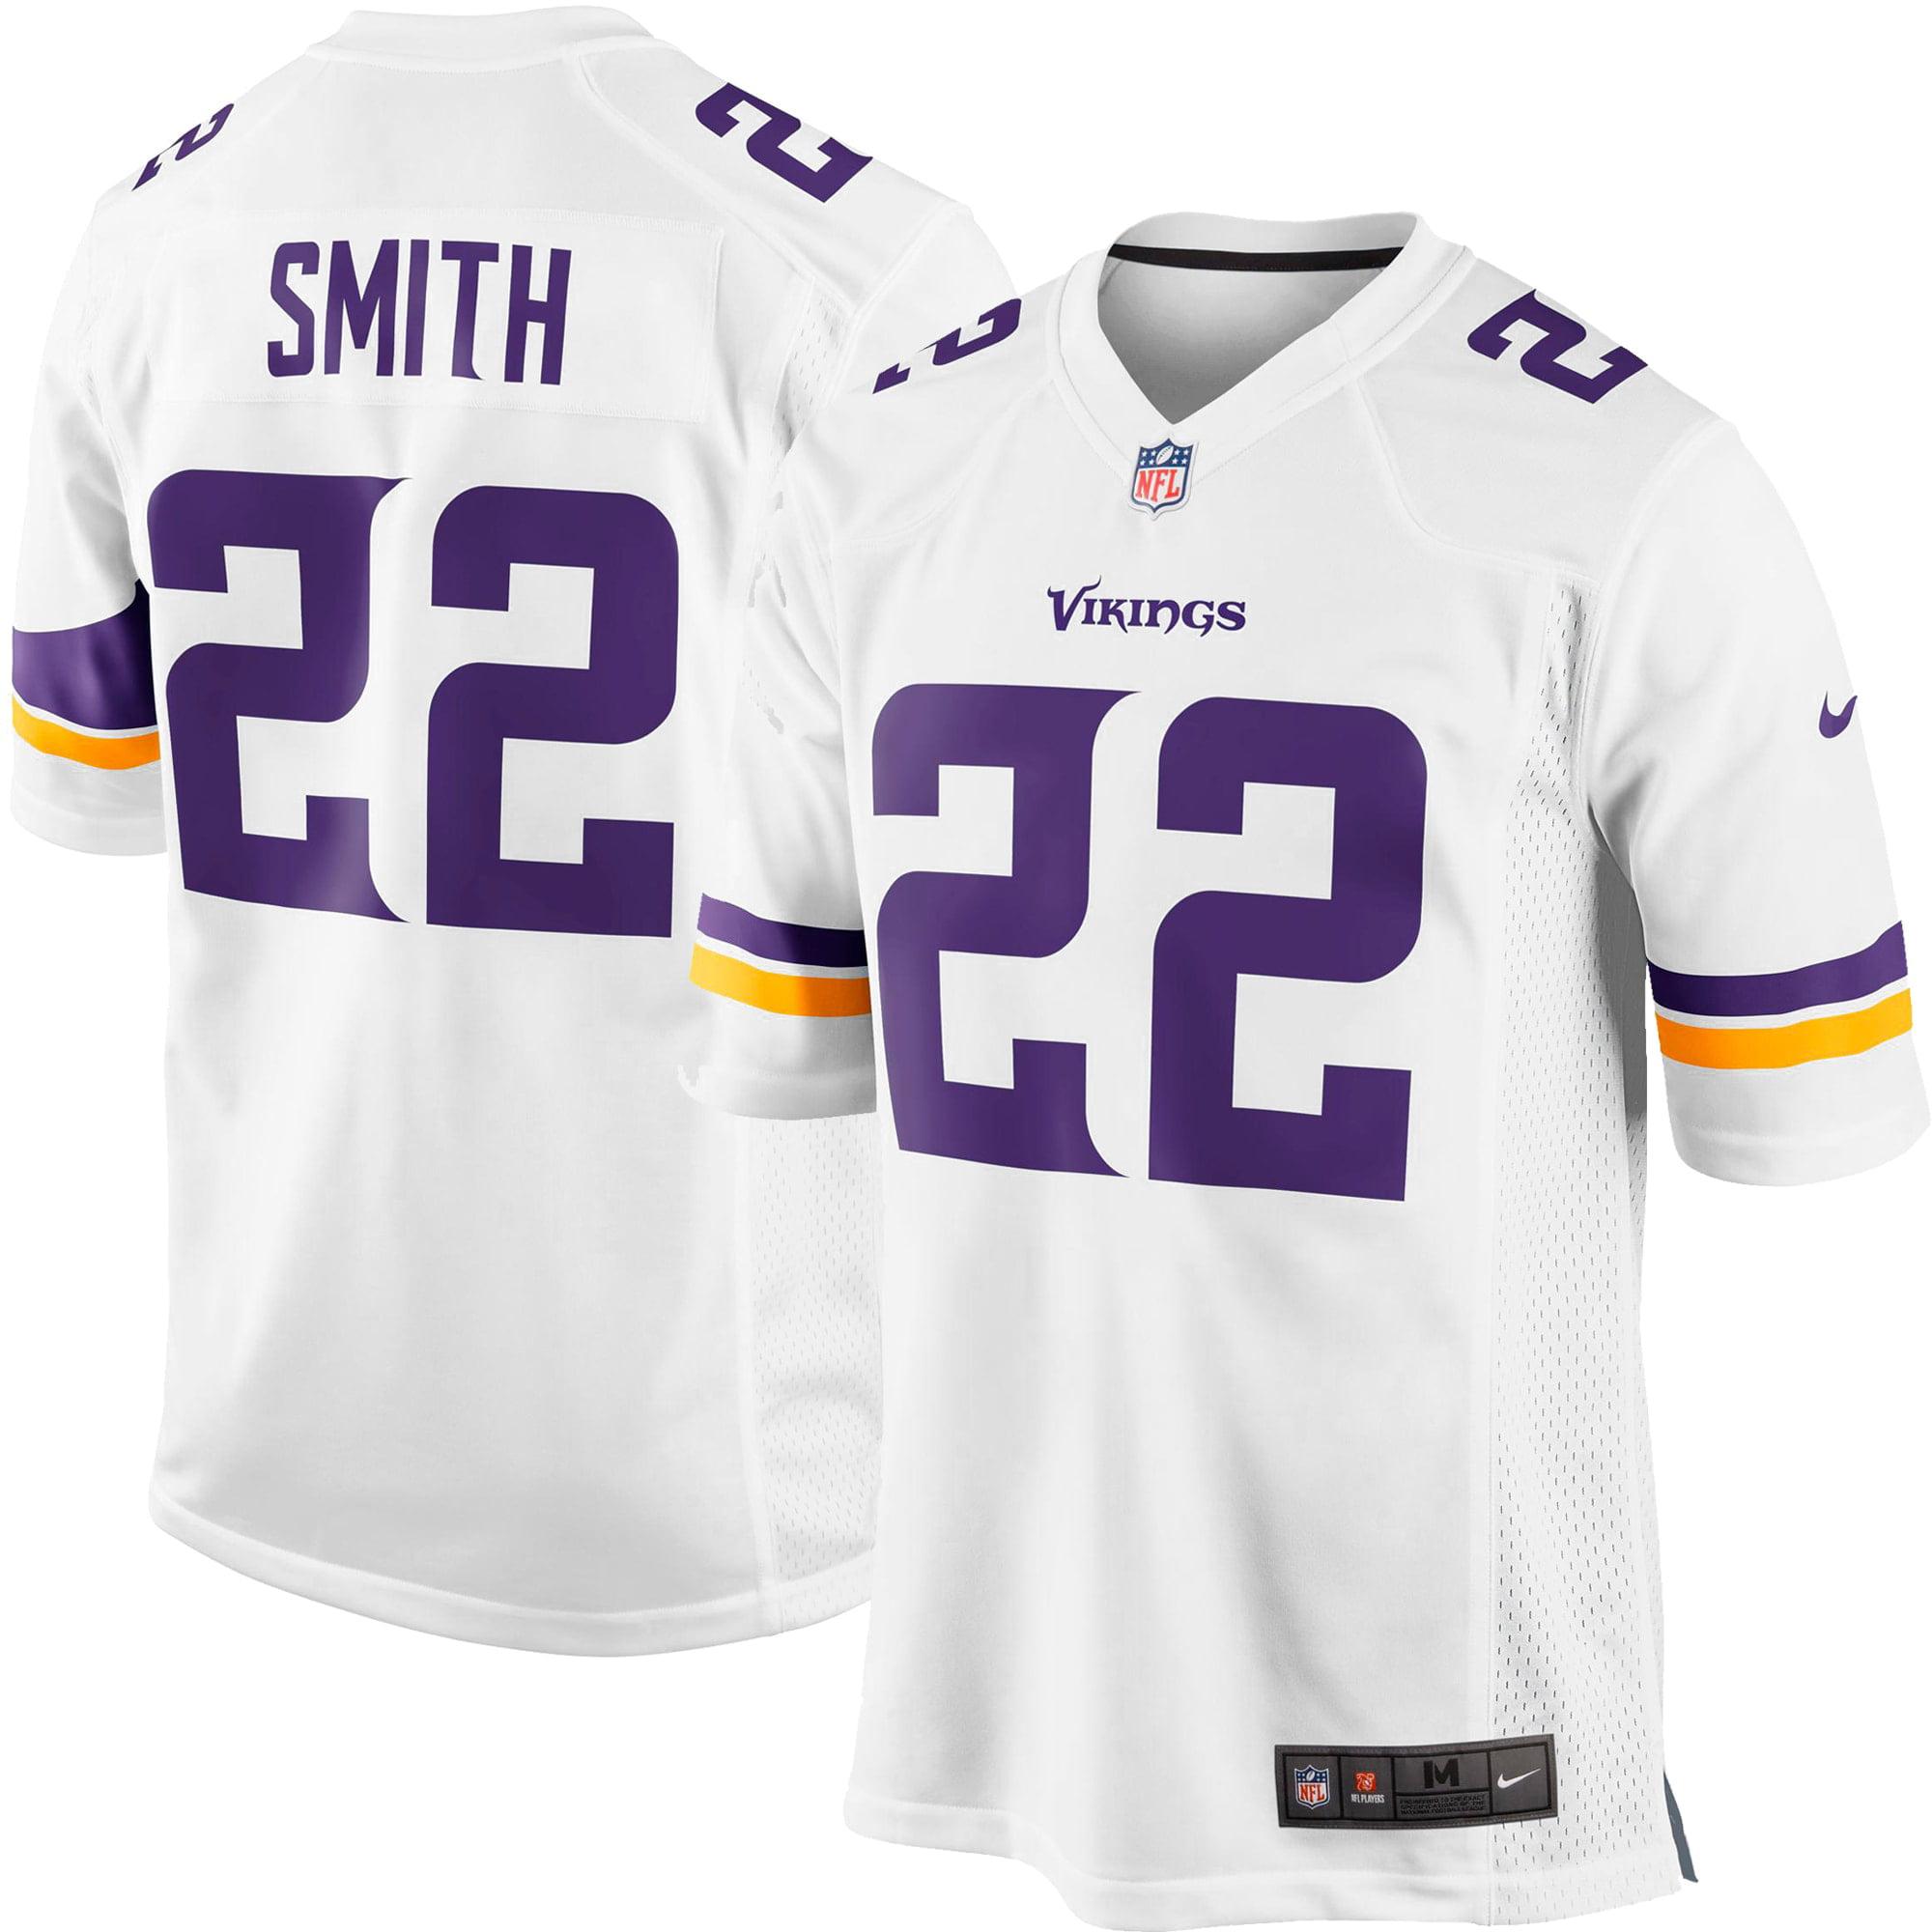 Harrison Smith Minnesota Vikings Nike Youth Game Jersey - White - Walmart.com